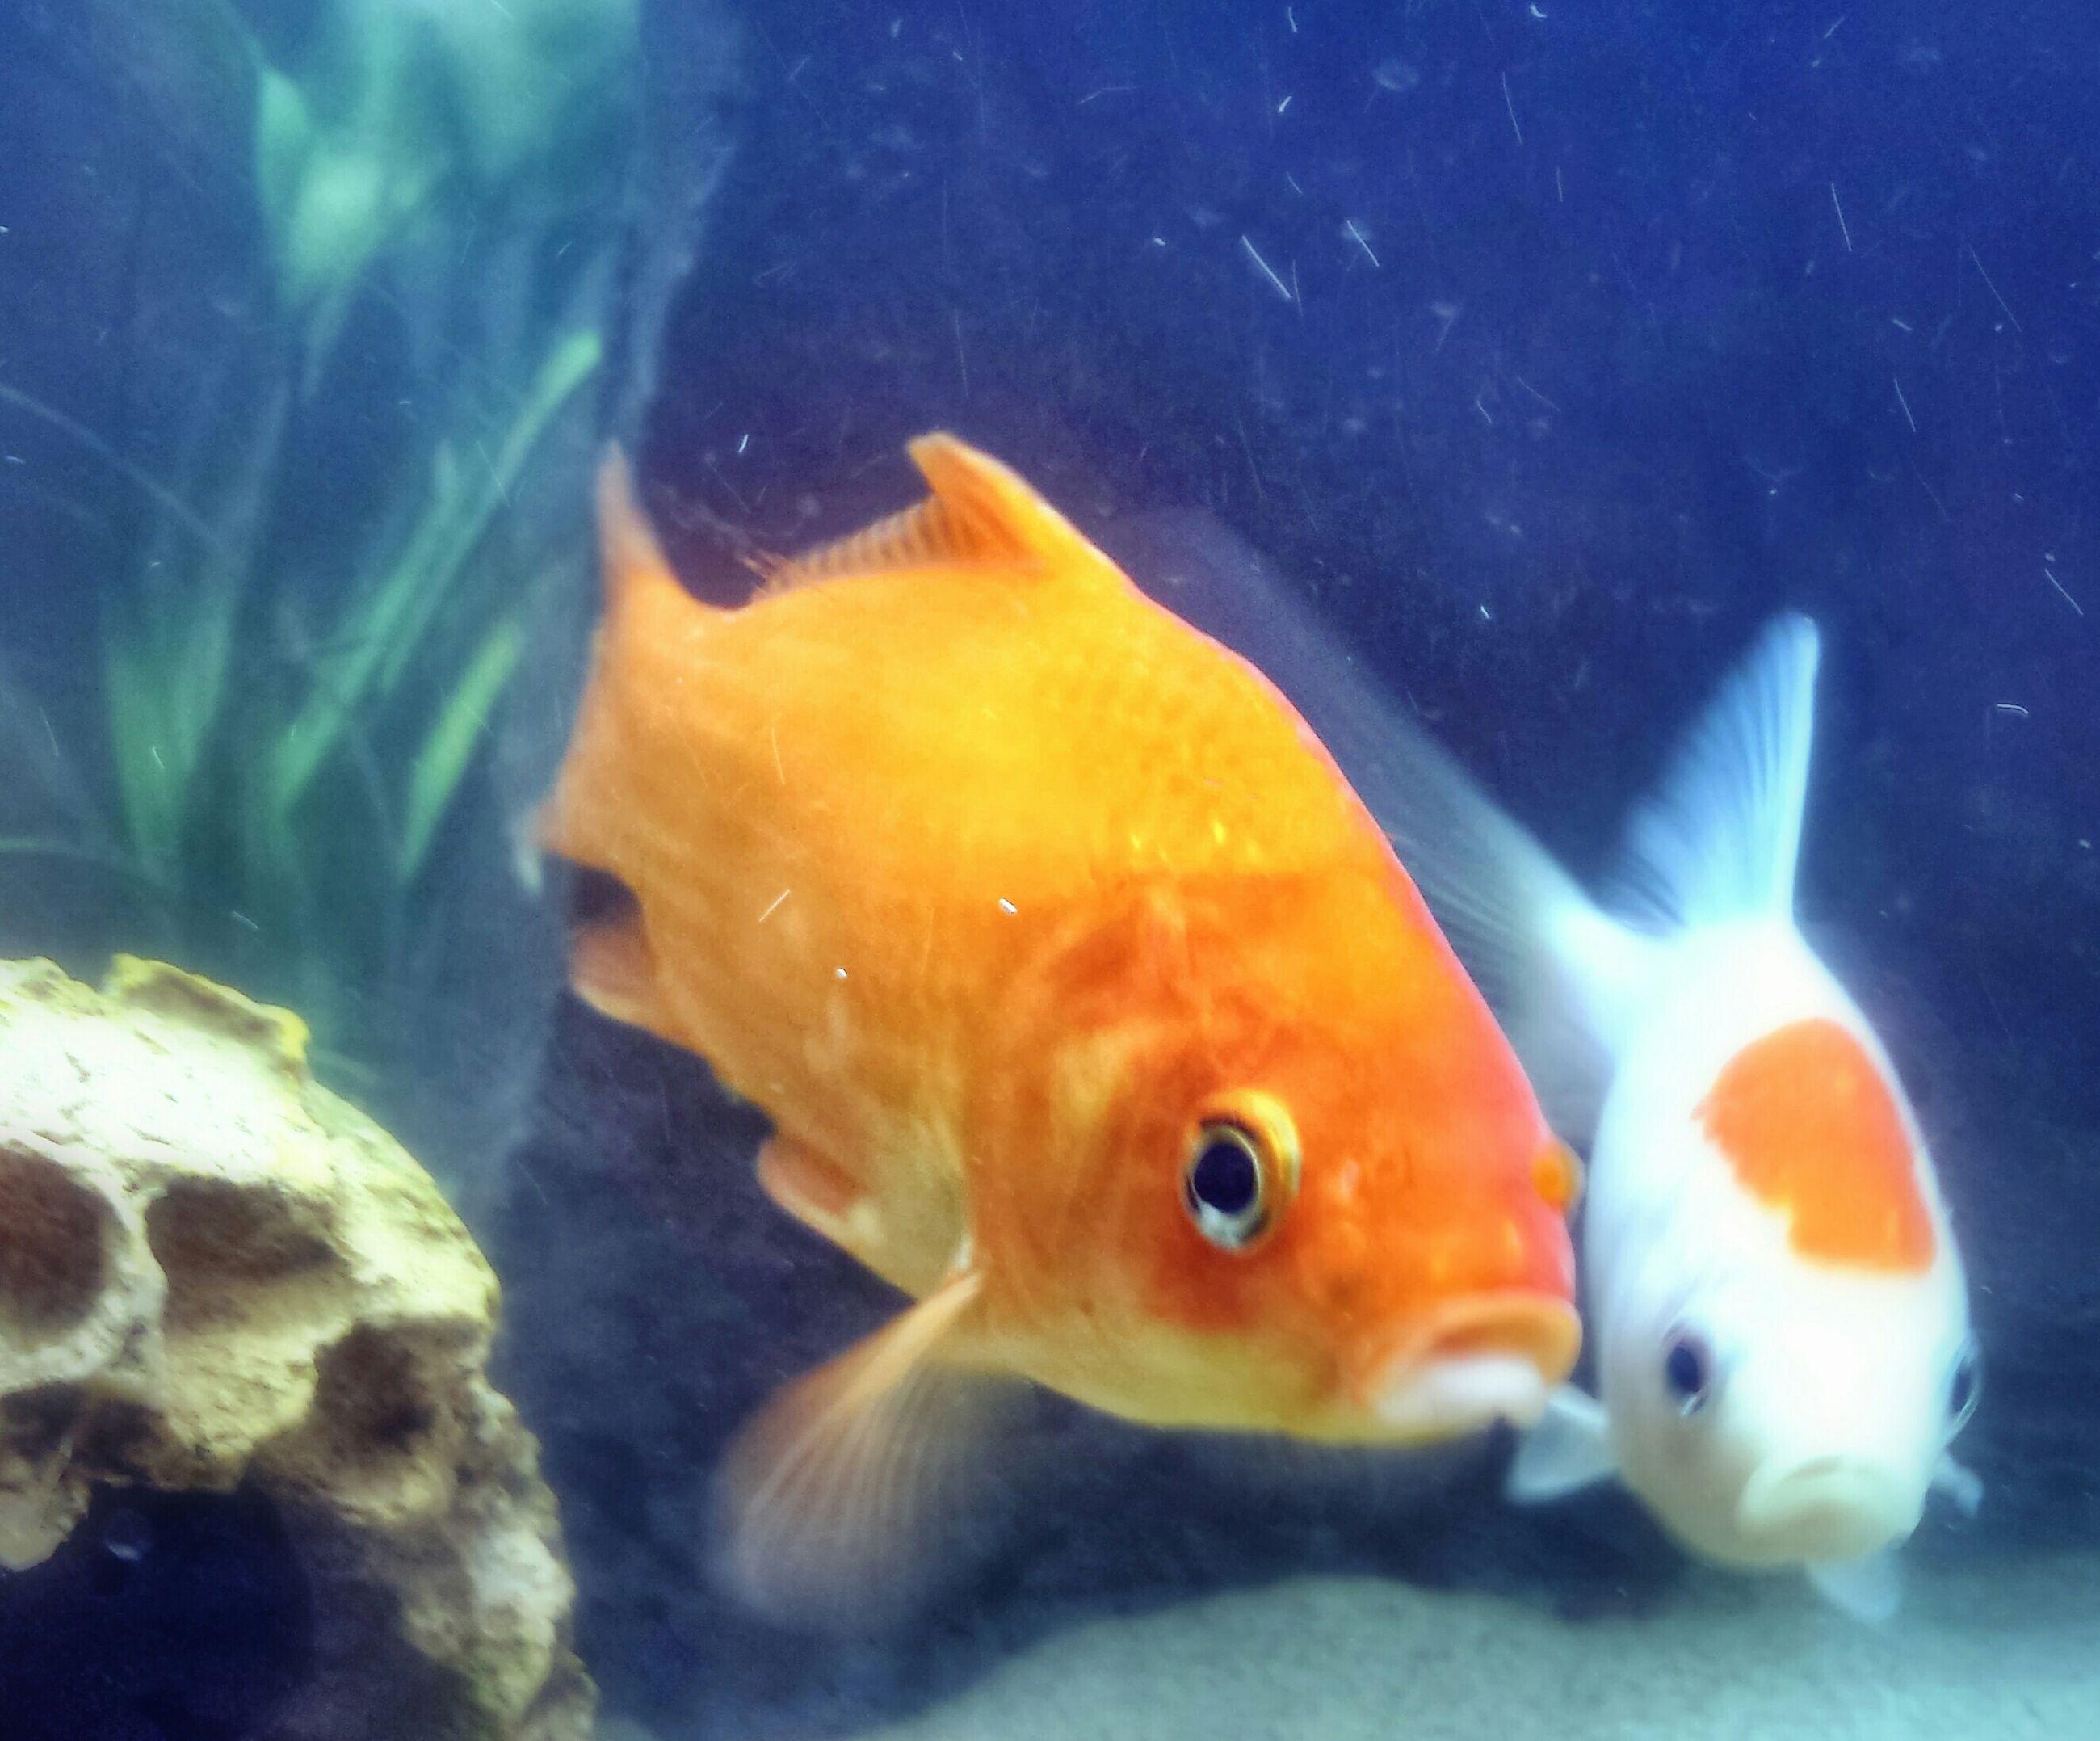 animal themes, underwater, fish, swimming, sea life, animals in the wild, wildlife, water, undersea, one animal, aquarium, close-up, indoors, sea, fish tank, animals in captivity, nature, transparent, coral, aquatic